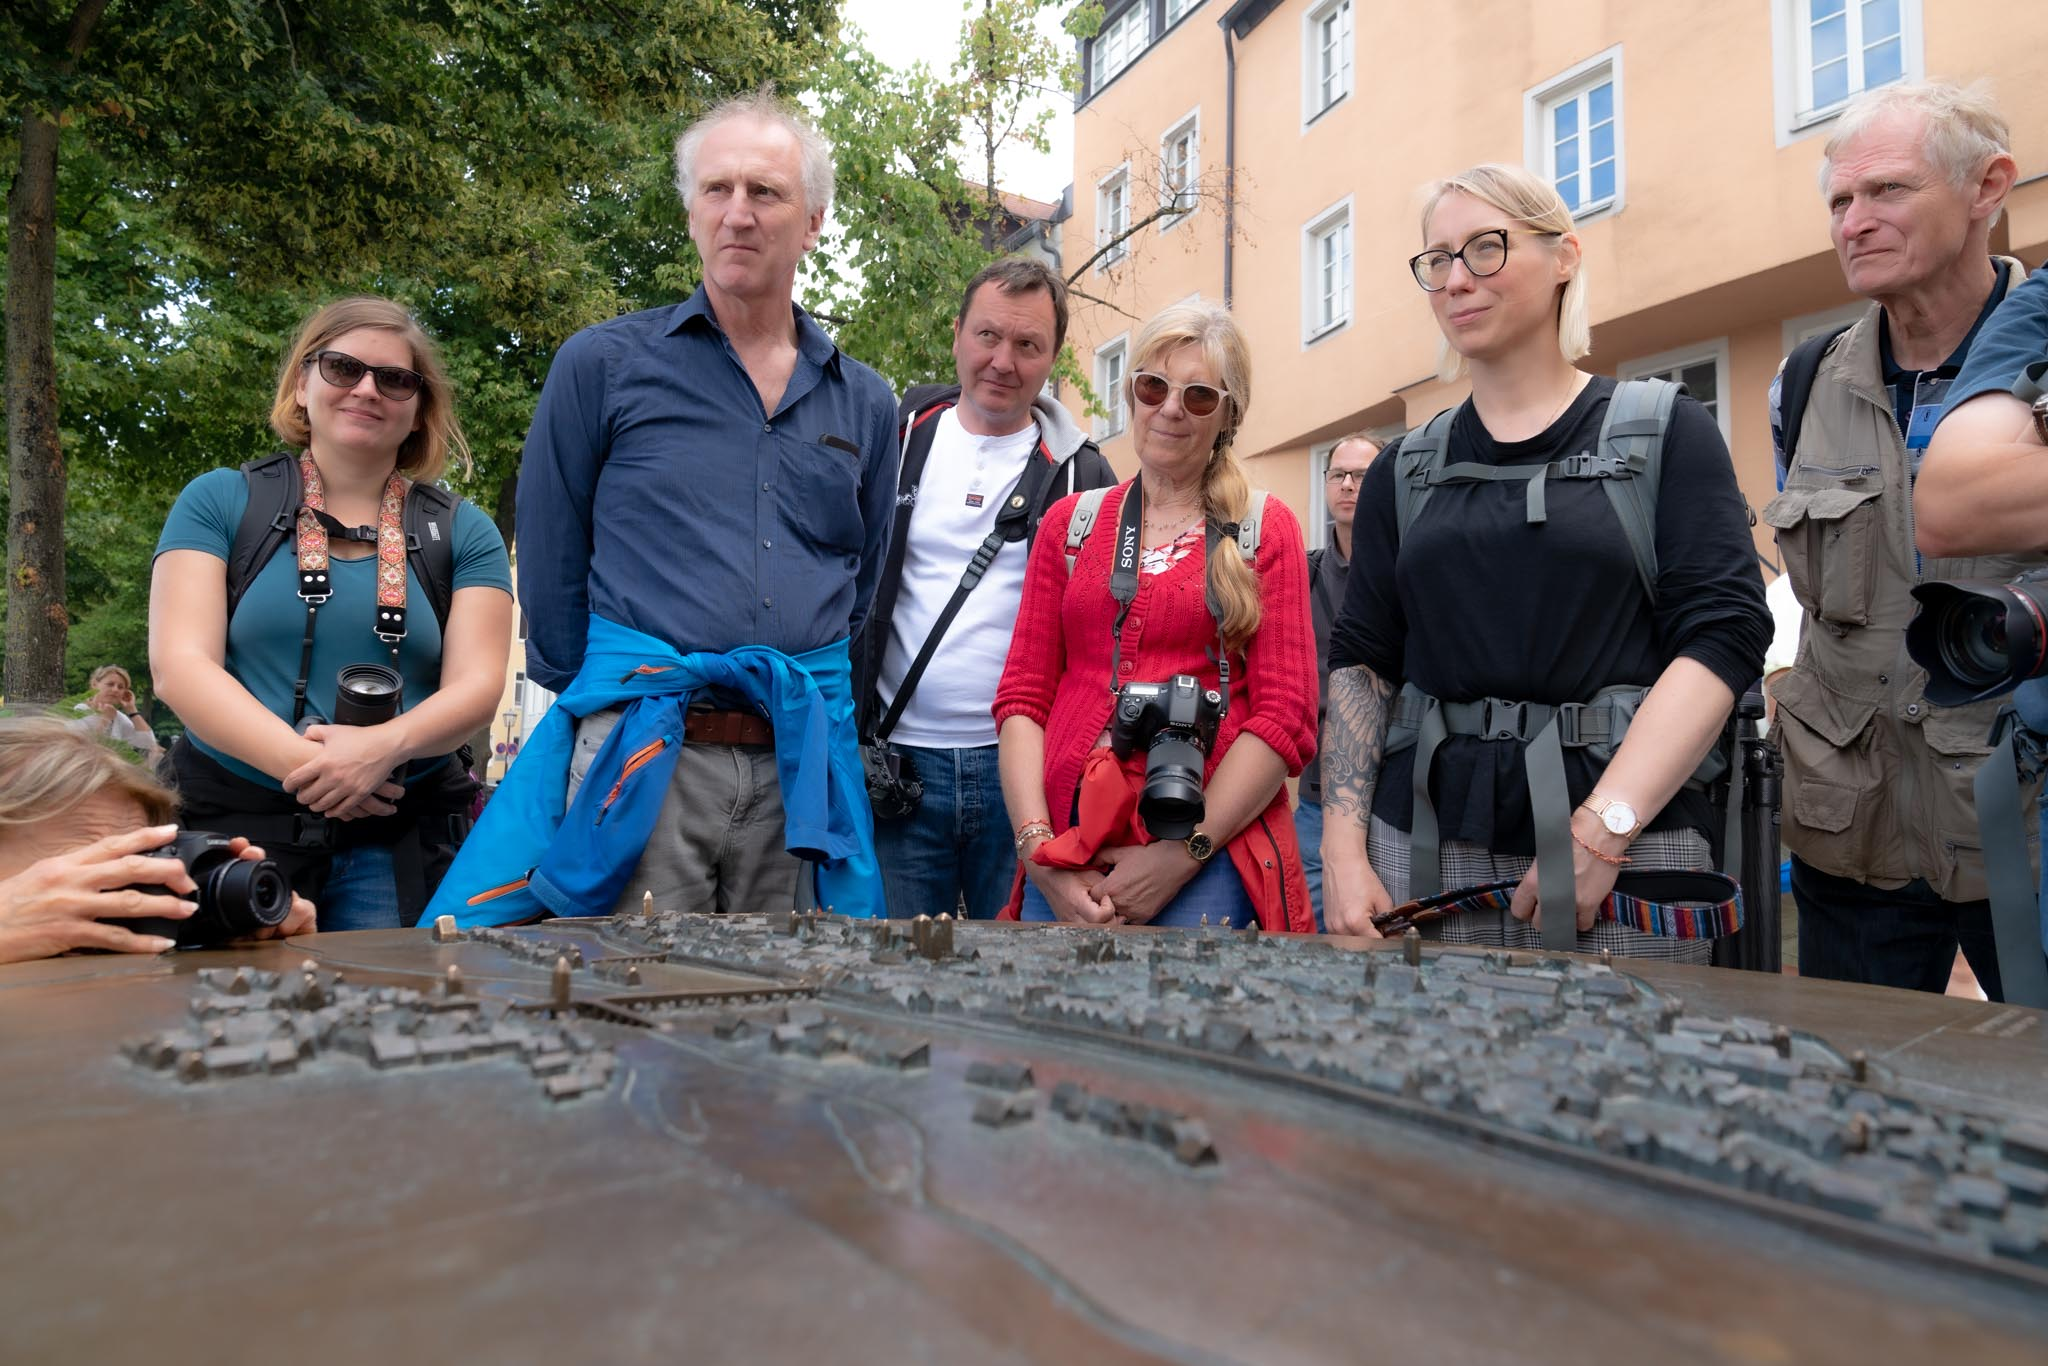 Hinter den Kulissen: Stadtführung in Regensburg (Foto: Andy Ilmberger)